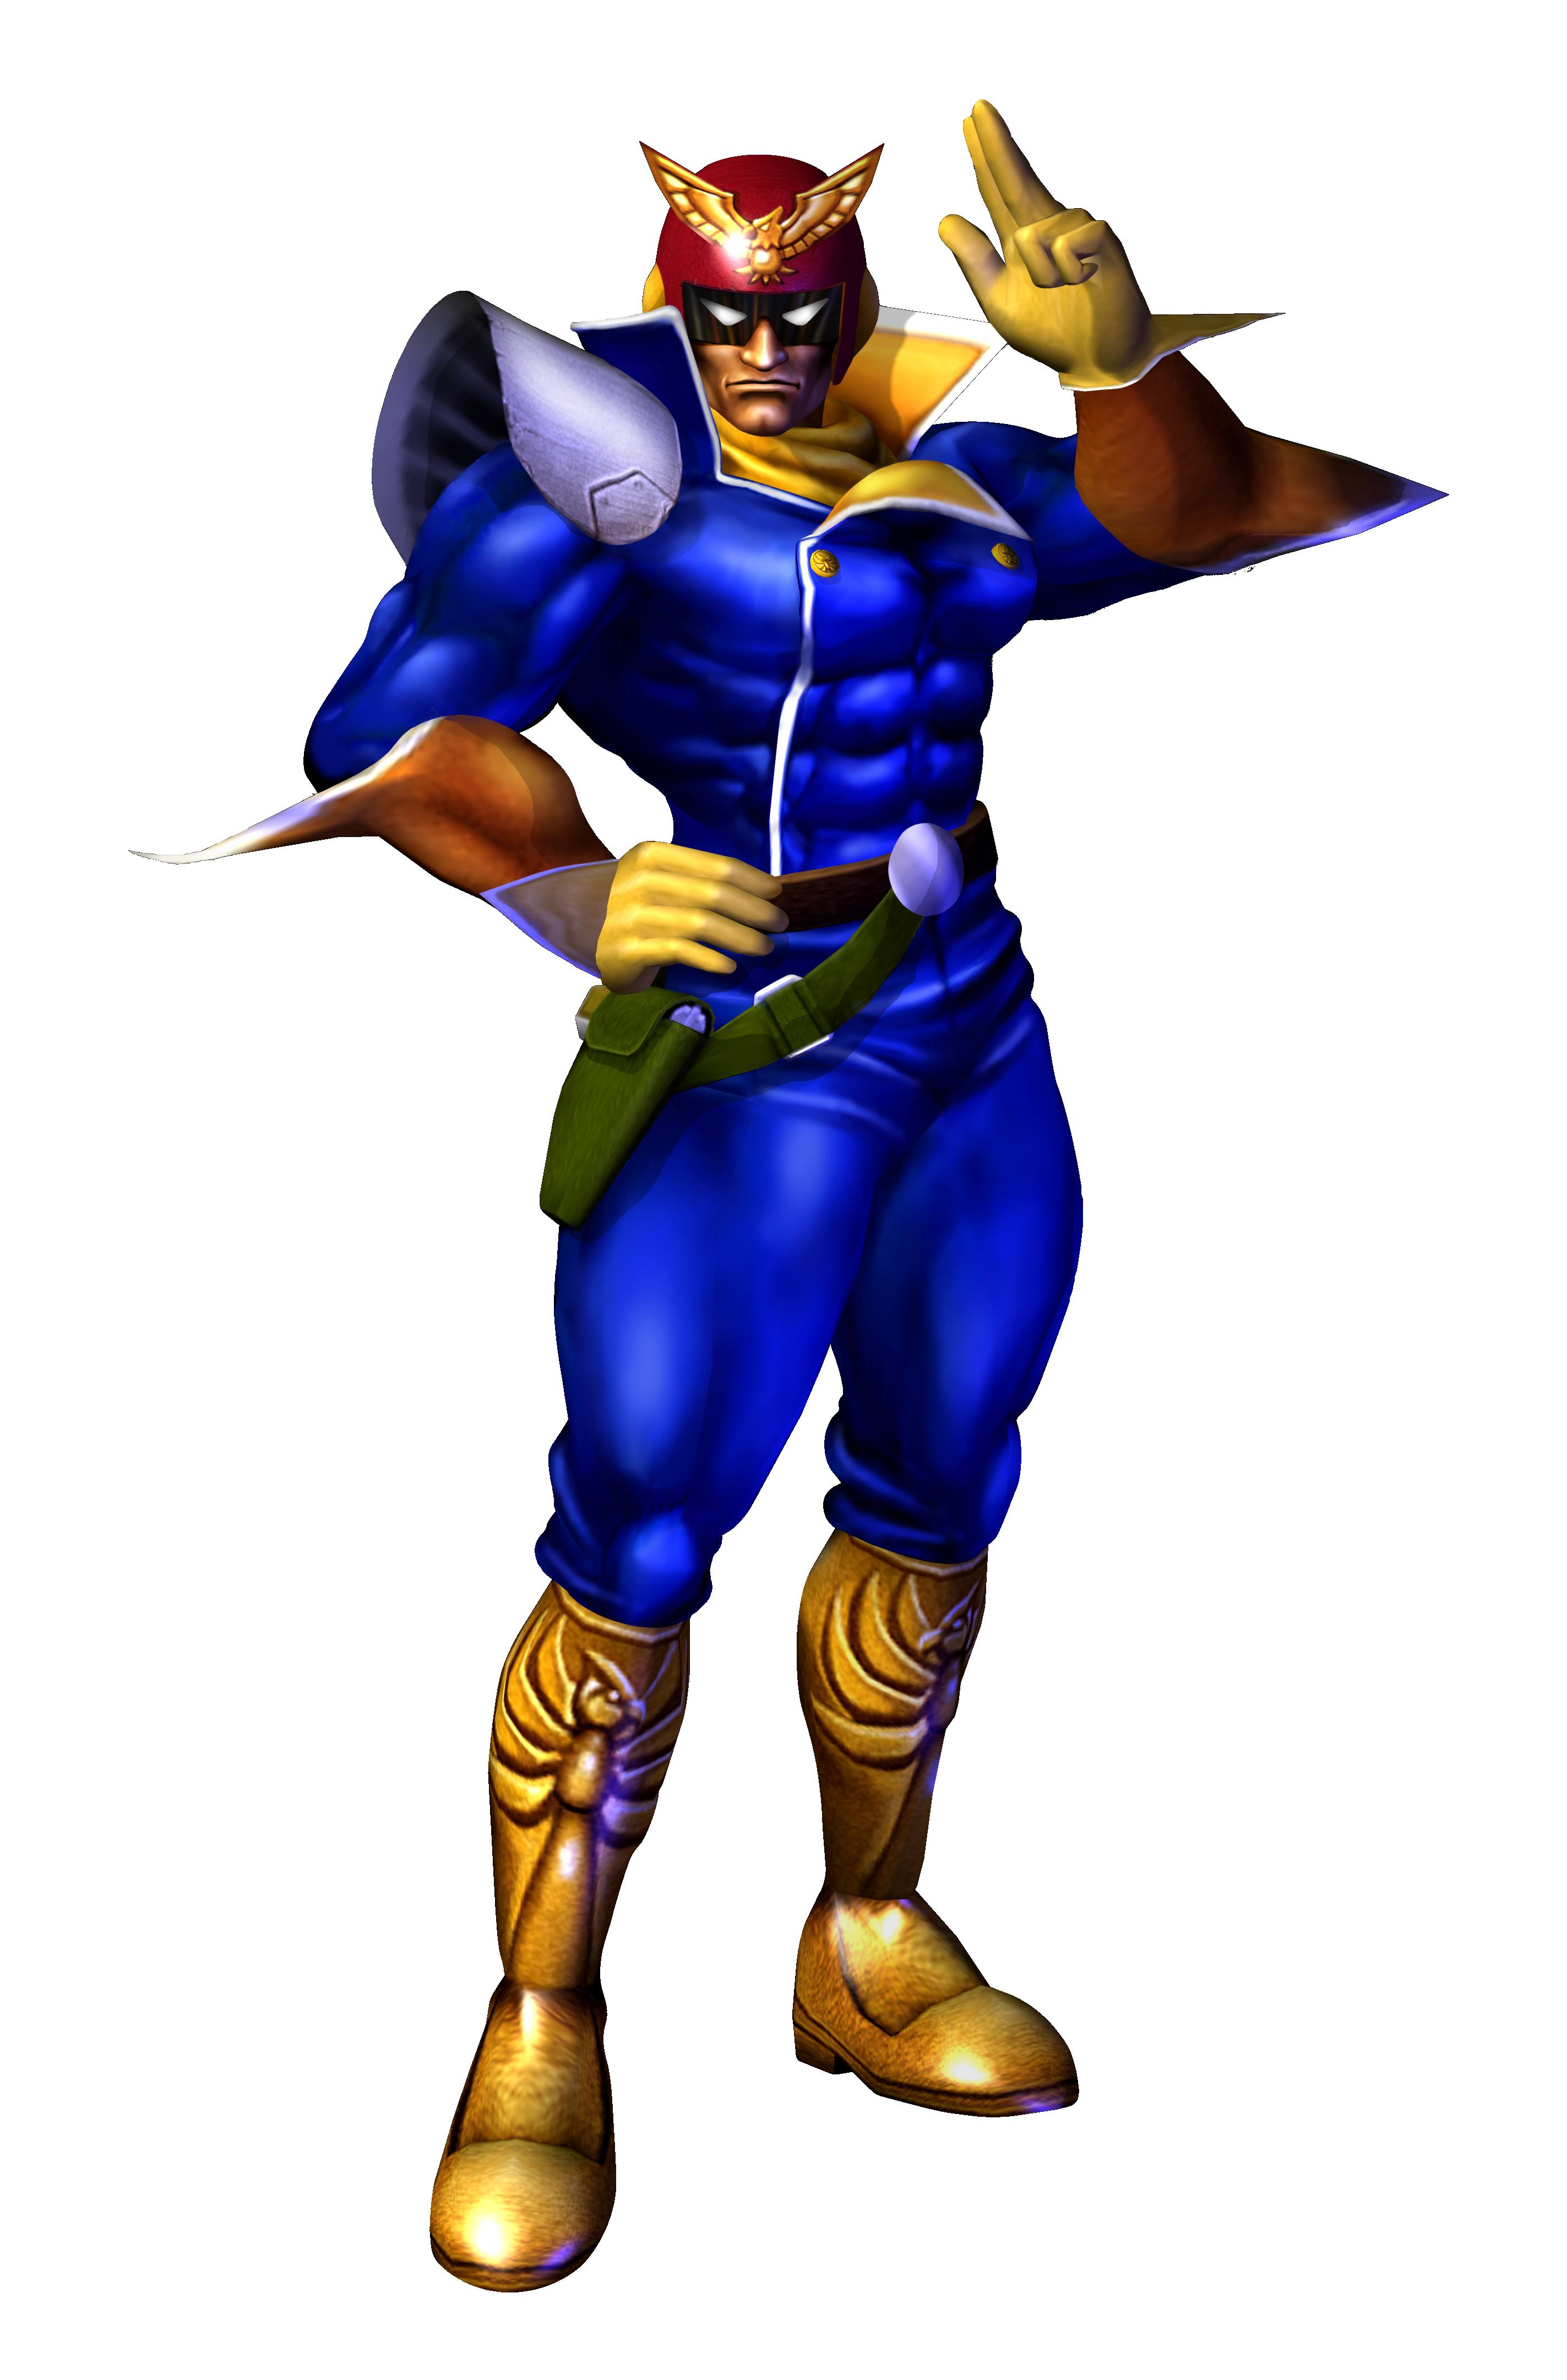 Image - HW Zelda Dominion Rod.png   Nintendo   FANDOM